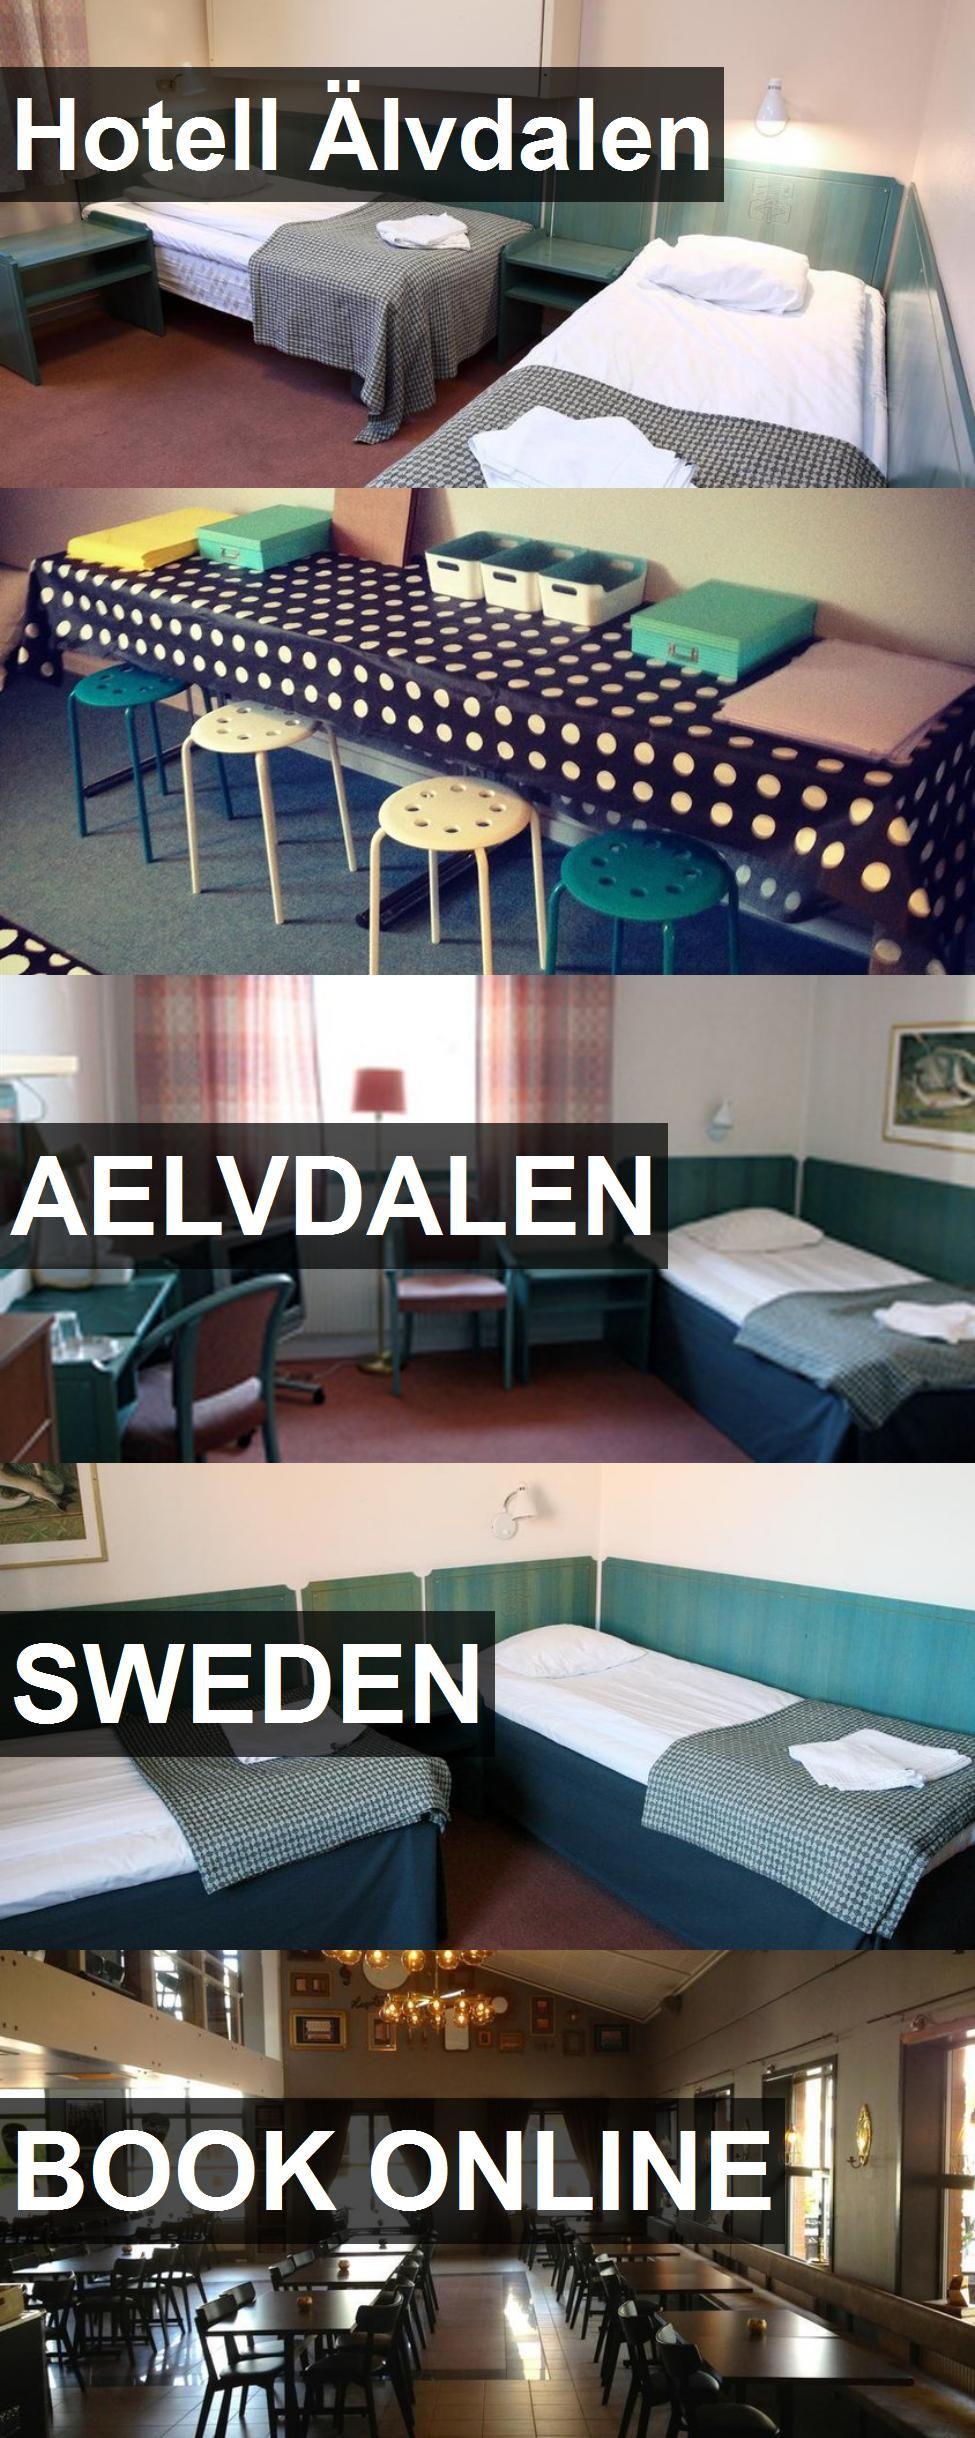 Hotell Älvdalen in Aelvdalen, Sweden. For more information